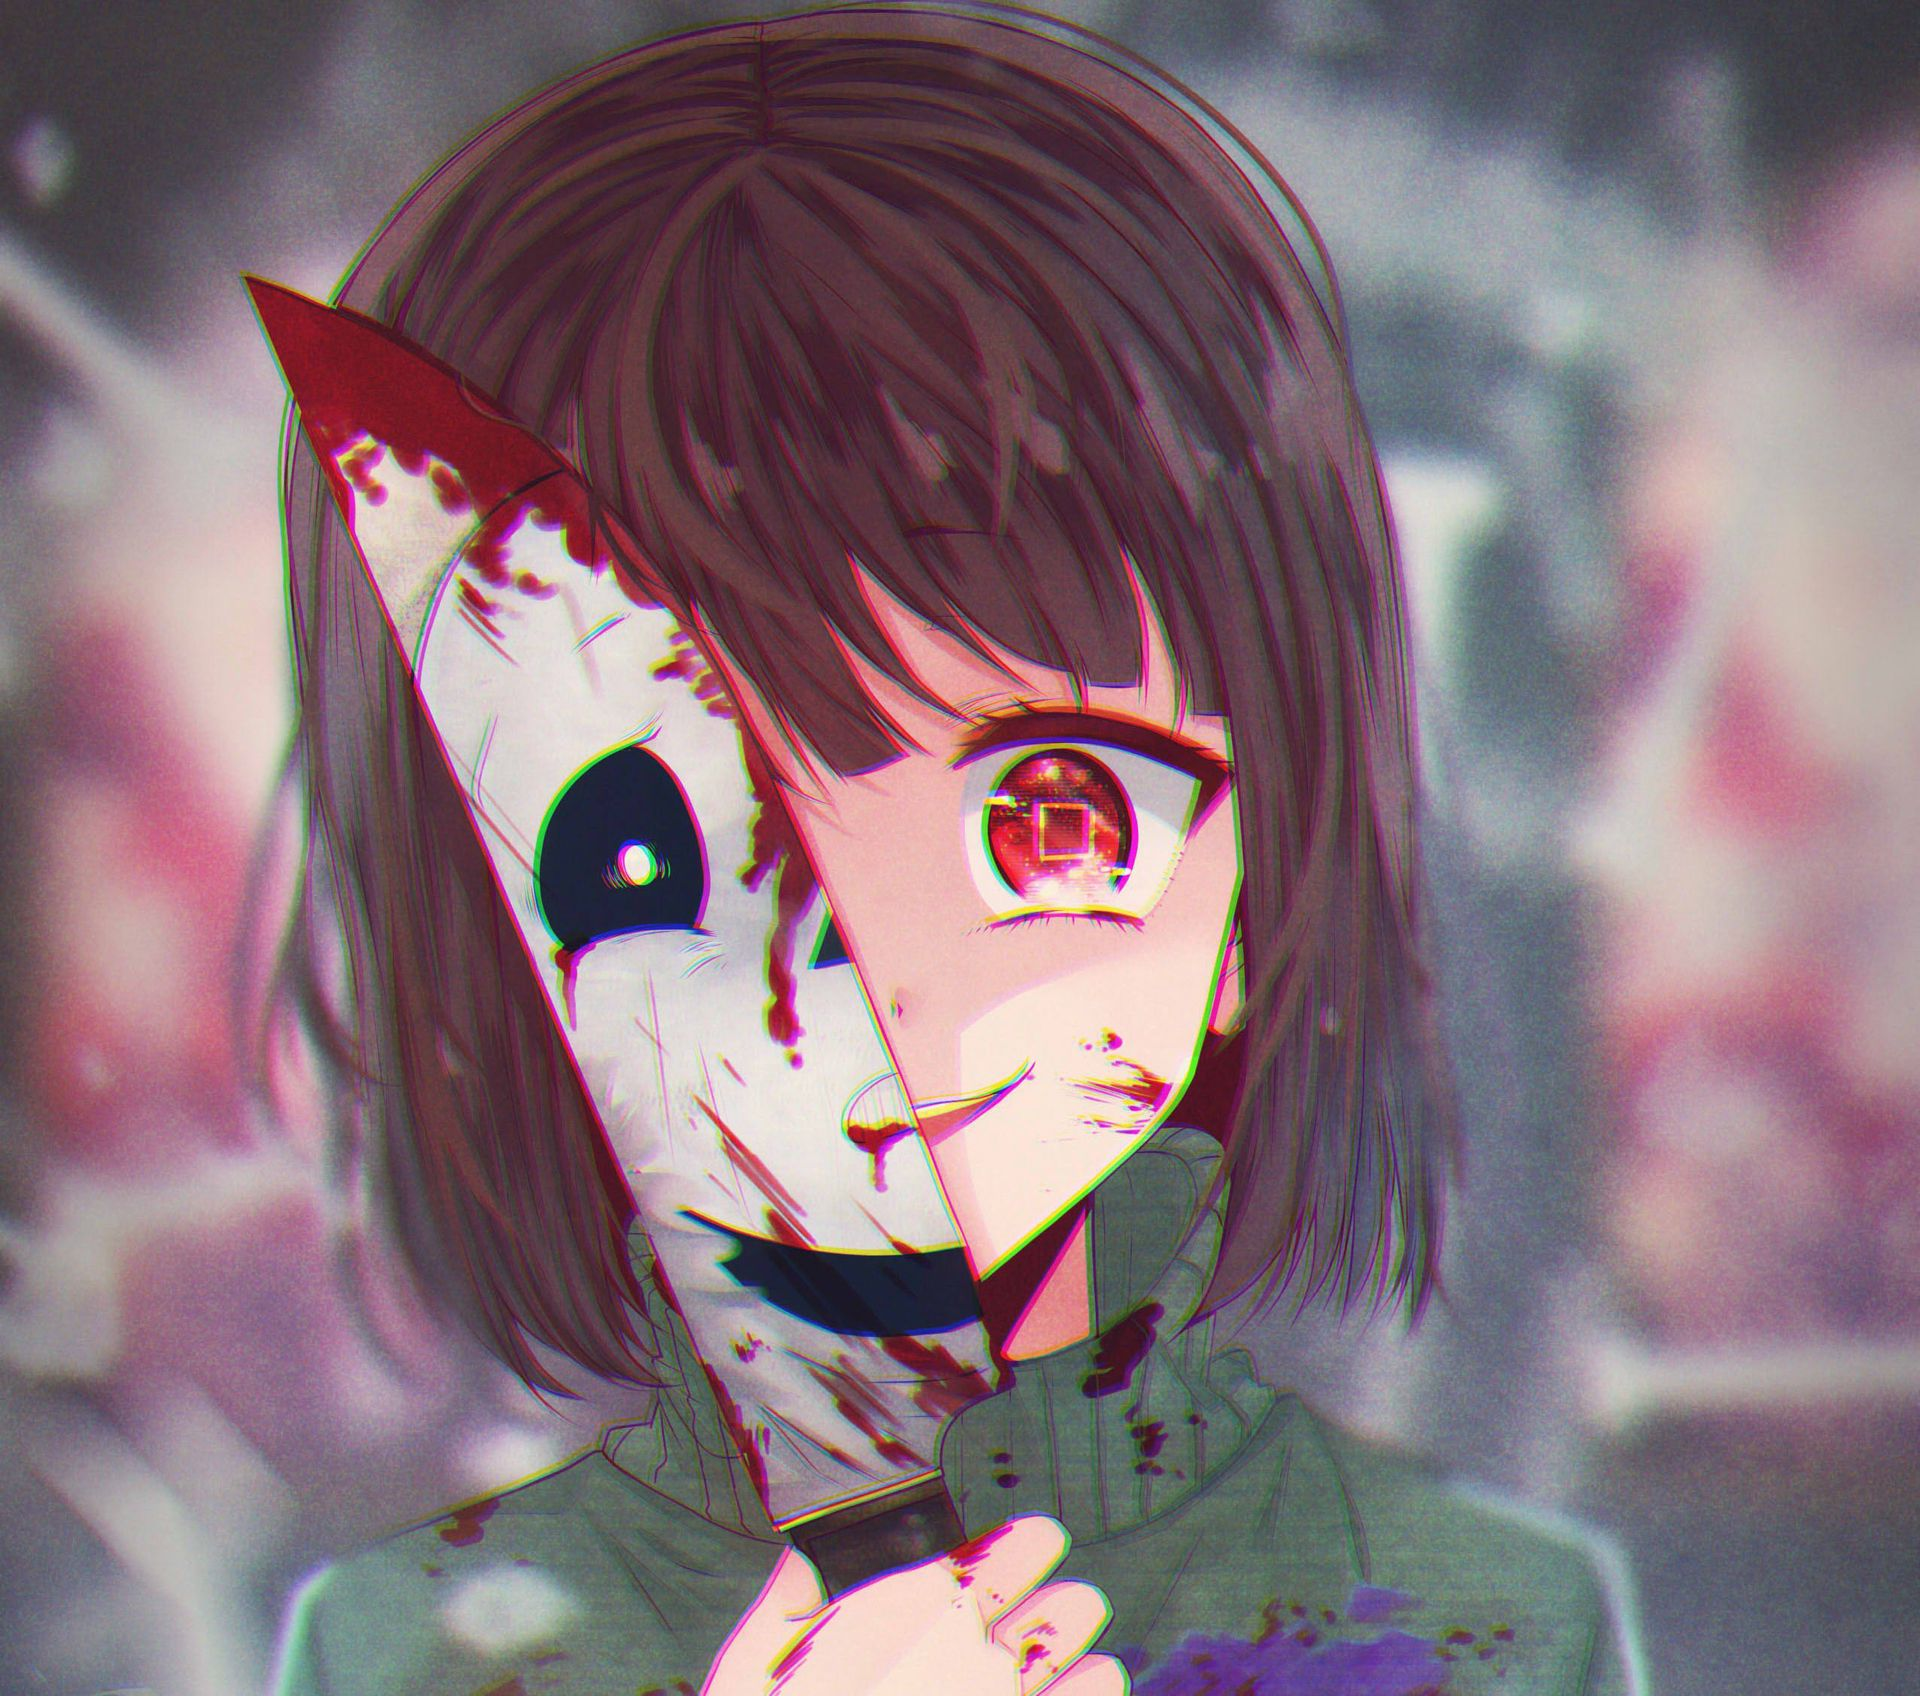 Mangareader Horror: I Am Laughing. I Am Bleeding. {Undertale Chara} {ONE SHOT